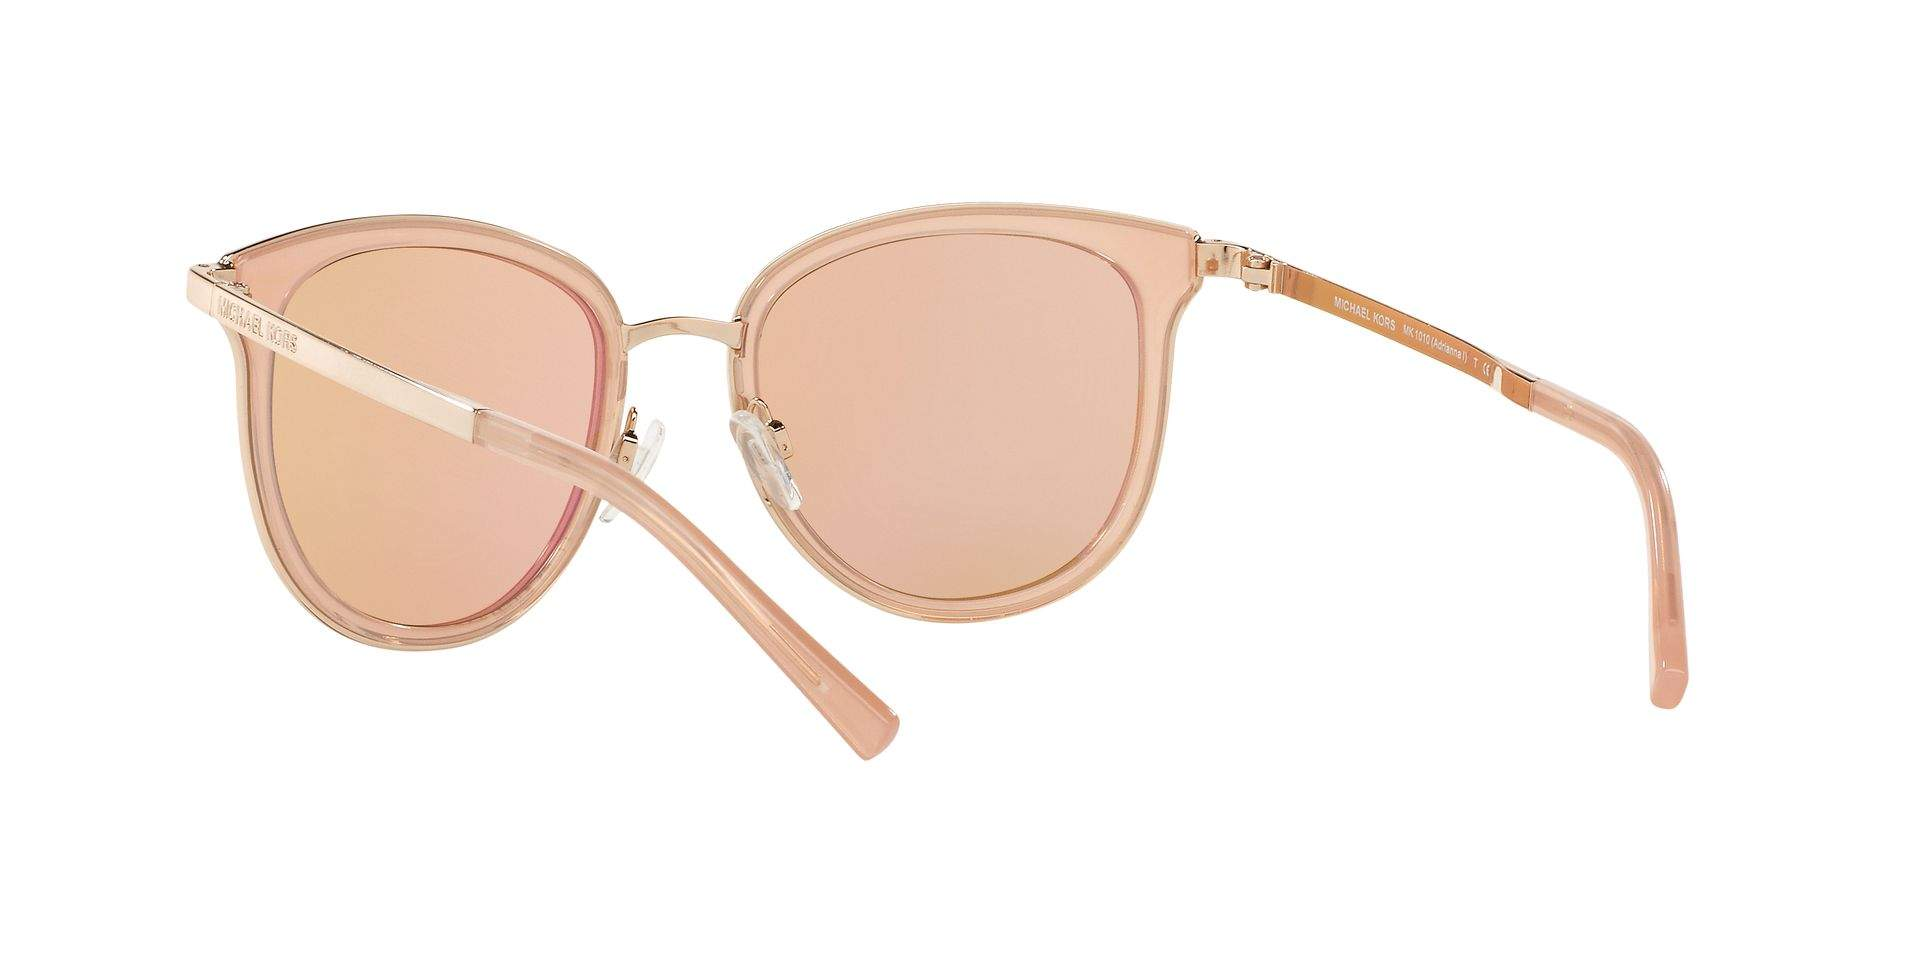 c55f14e027 Sunglasses Michael kors Adrianna Gold MK1010 1103R1 54-20 Medium